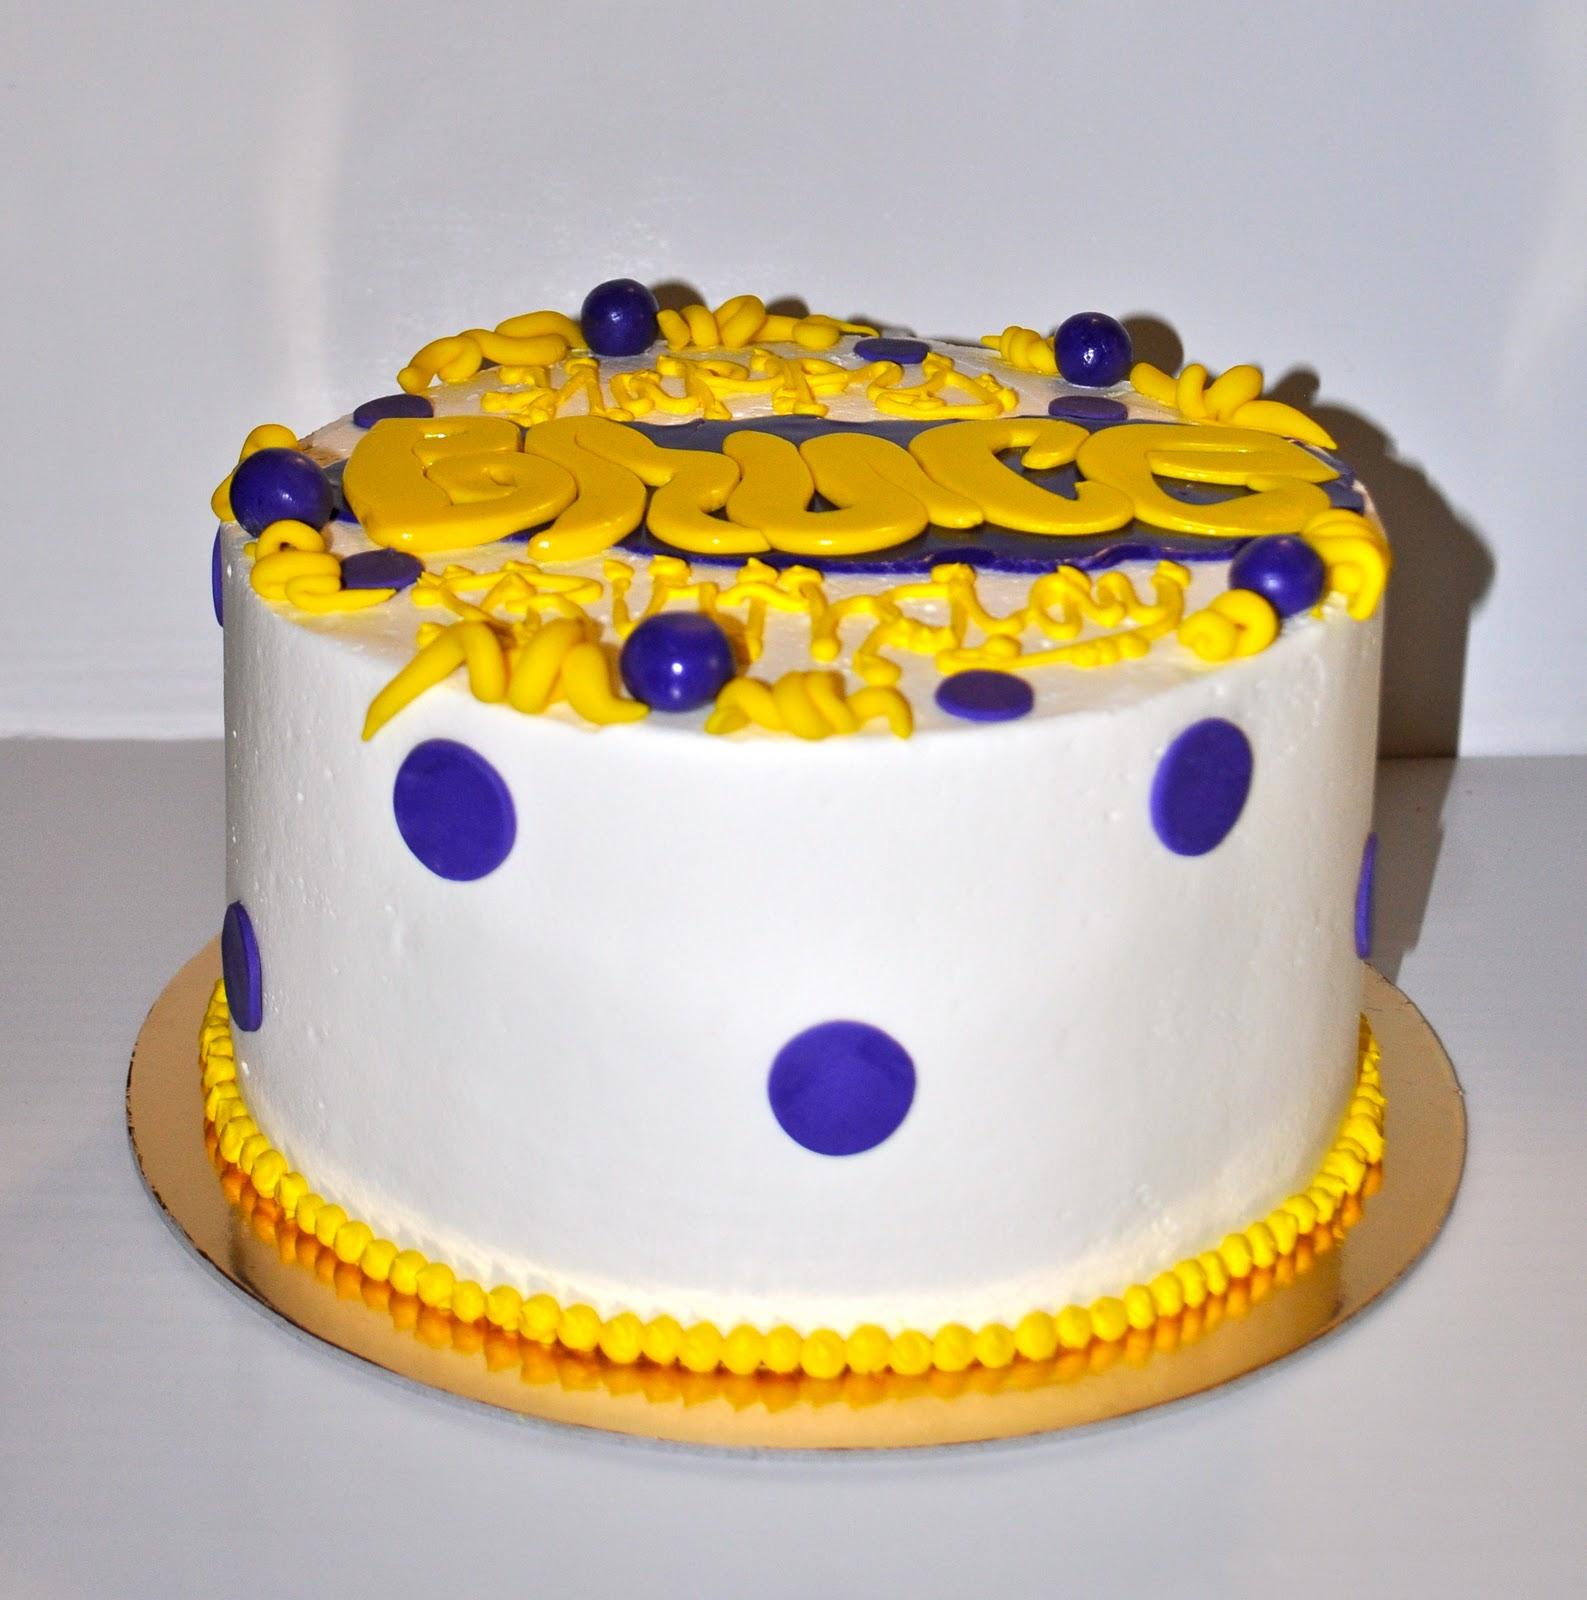 Lsu Birthday Cake Images